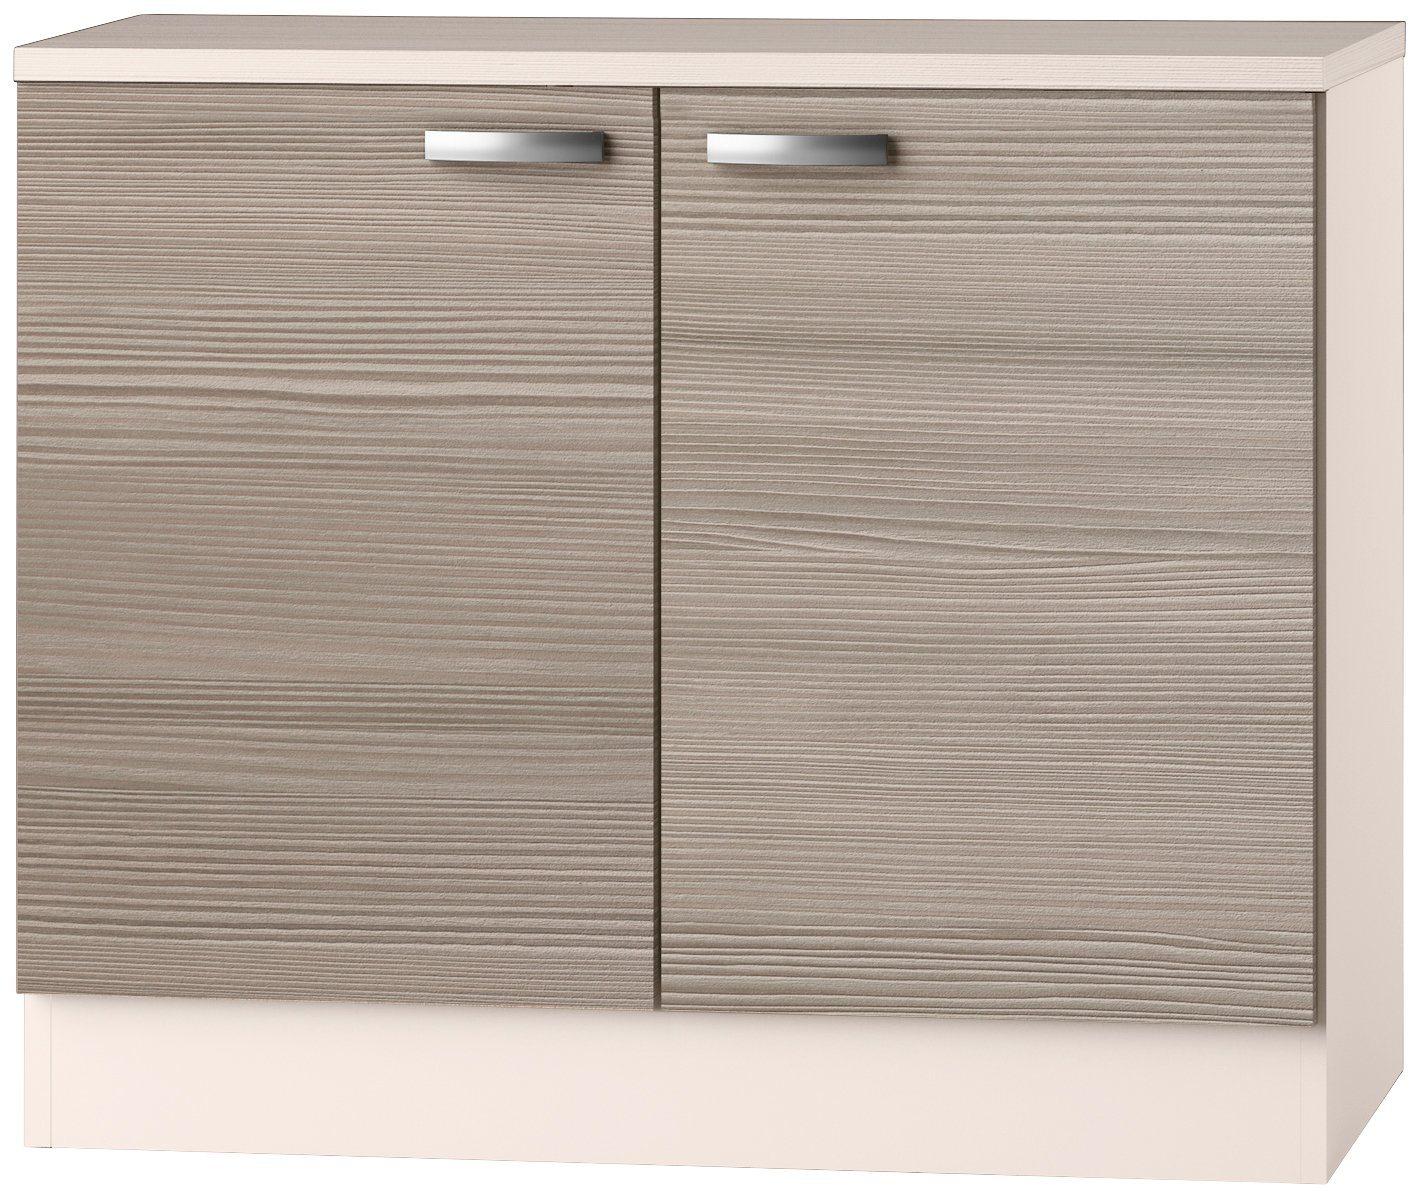 OPTIFIT Spülenschrank »Vigo«, Breite 100 cm | Küche und Esszimmer > Küchenschränke > Spülenschränke | Holzwerkstoff | OPTIFIT